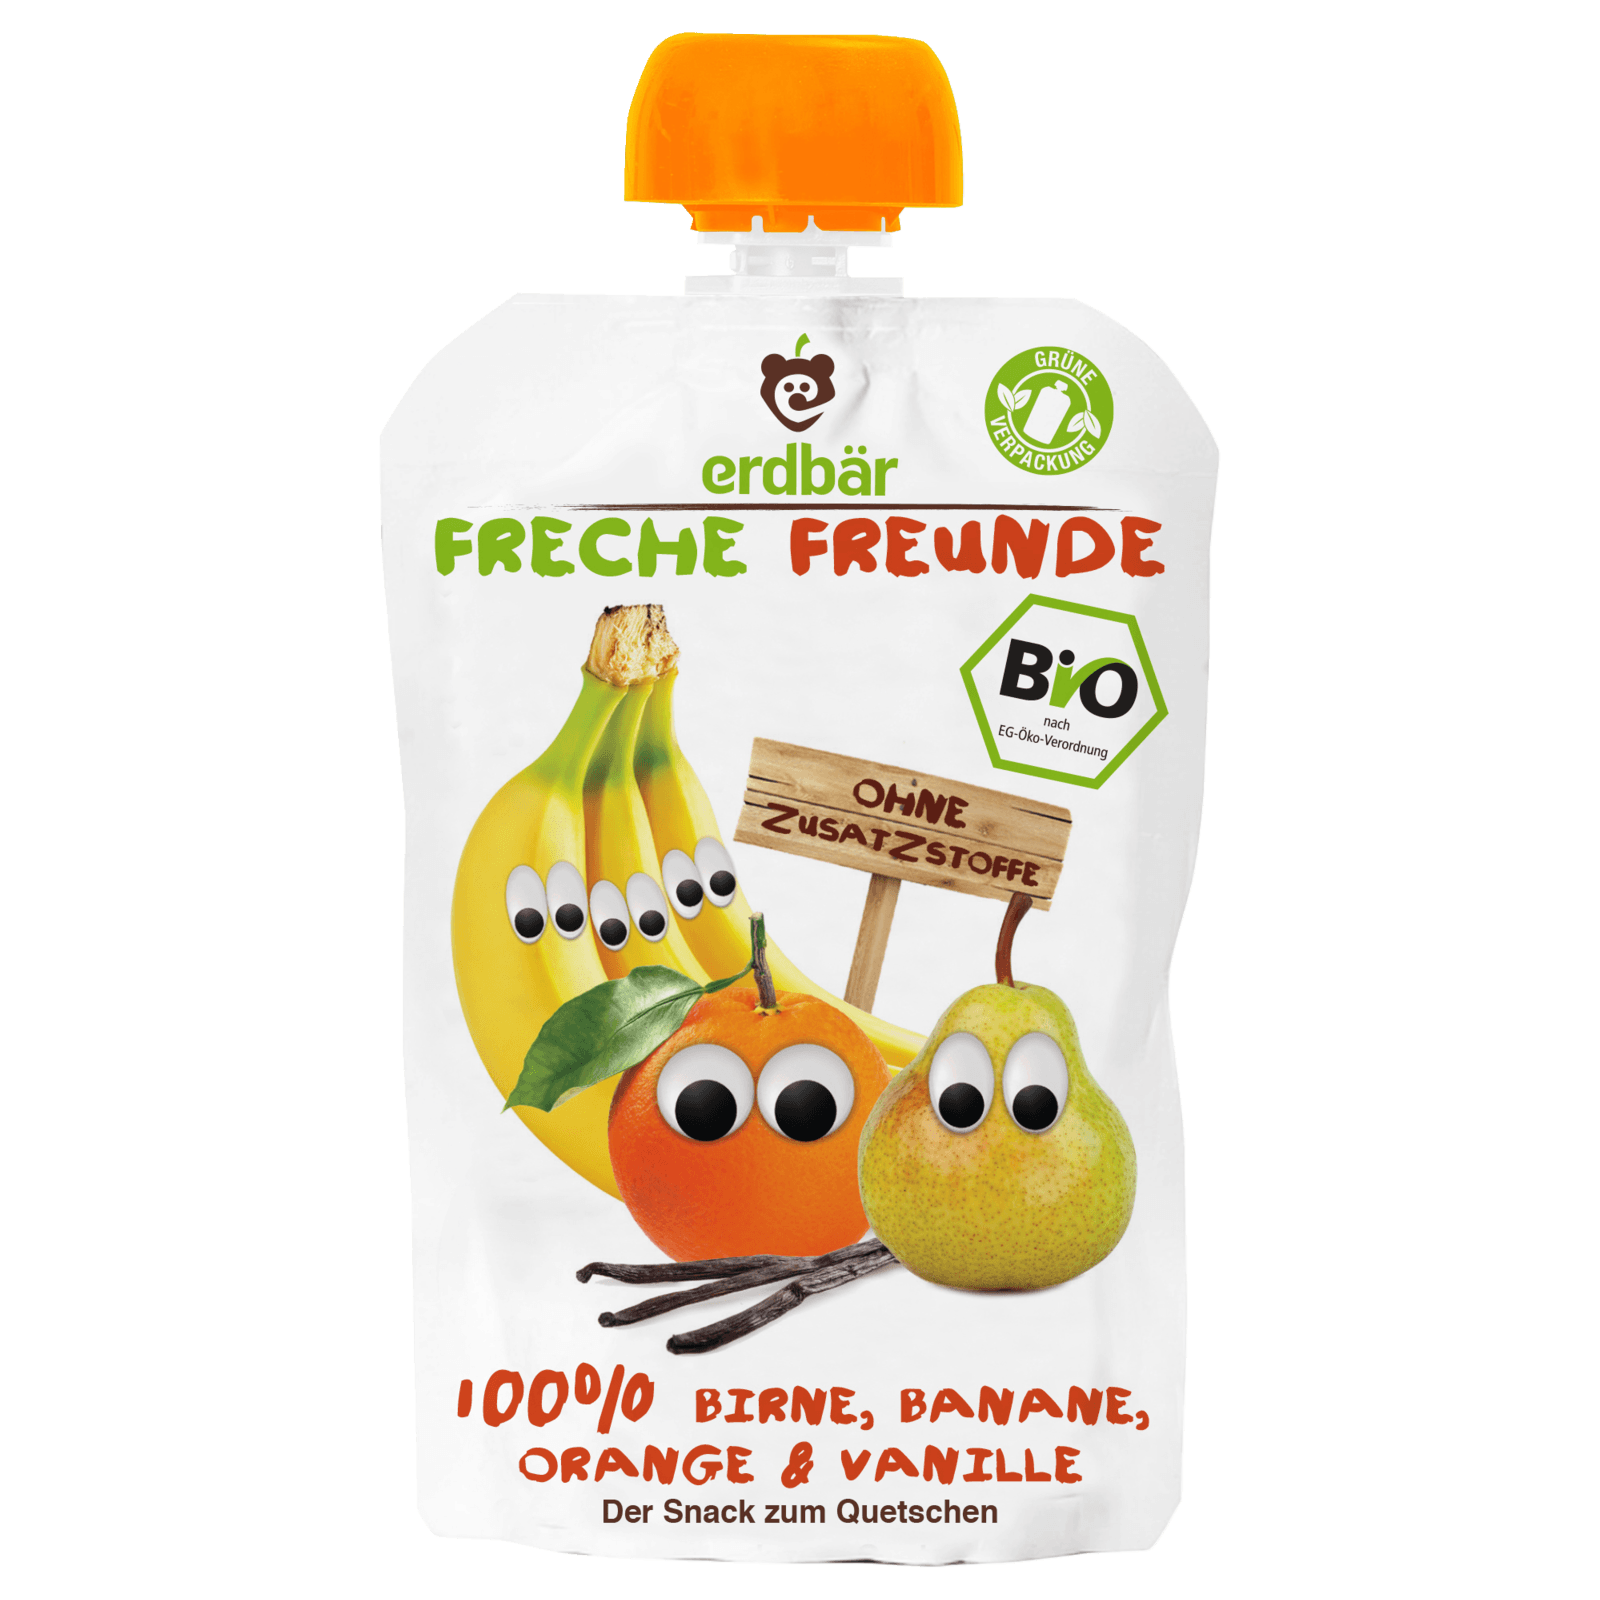 Erdbär Freche Freunde Birne, Banane, Orange, Vanille 100g